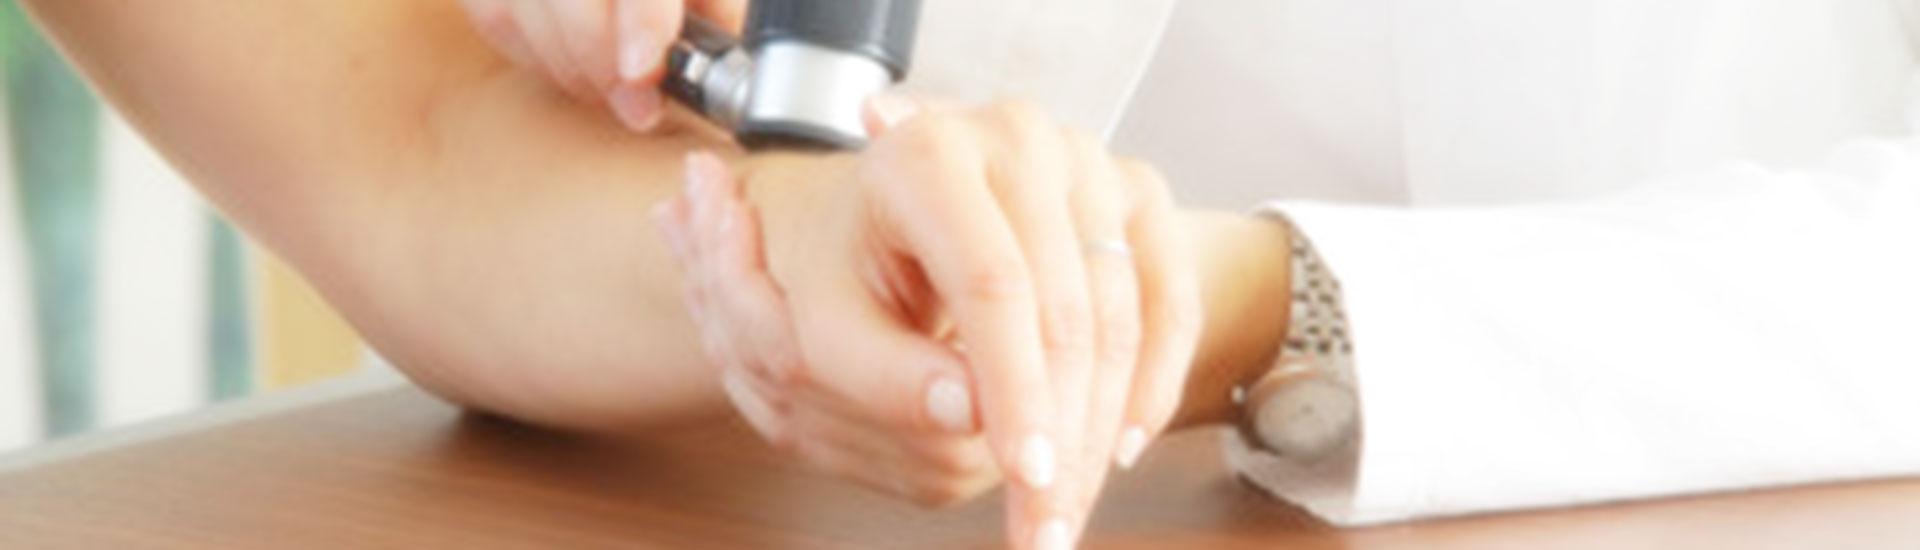 dermatologija dermatoskopija dermatolog dermatovenerolog